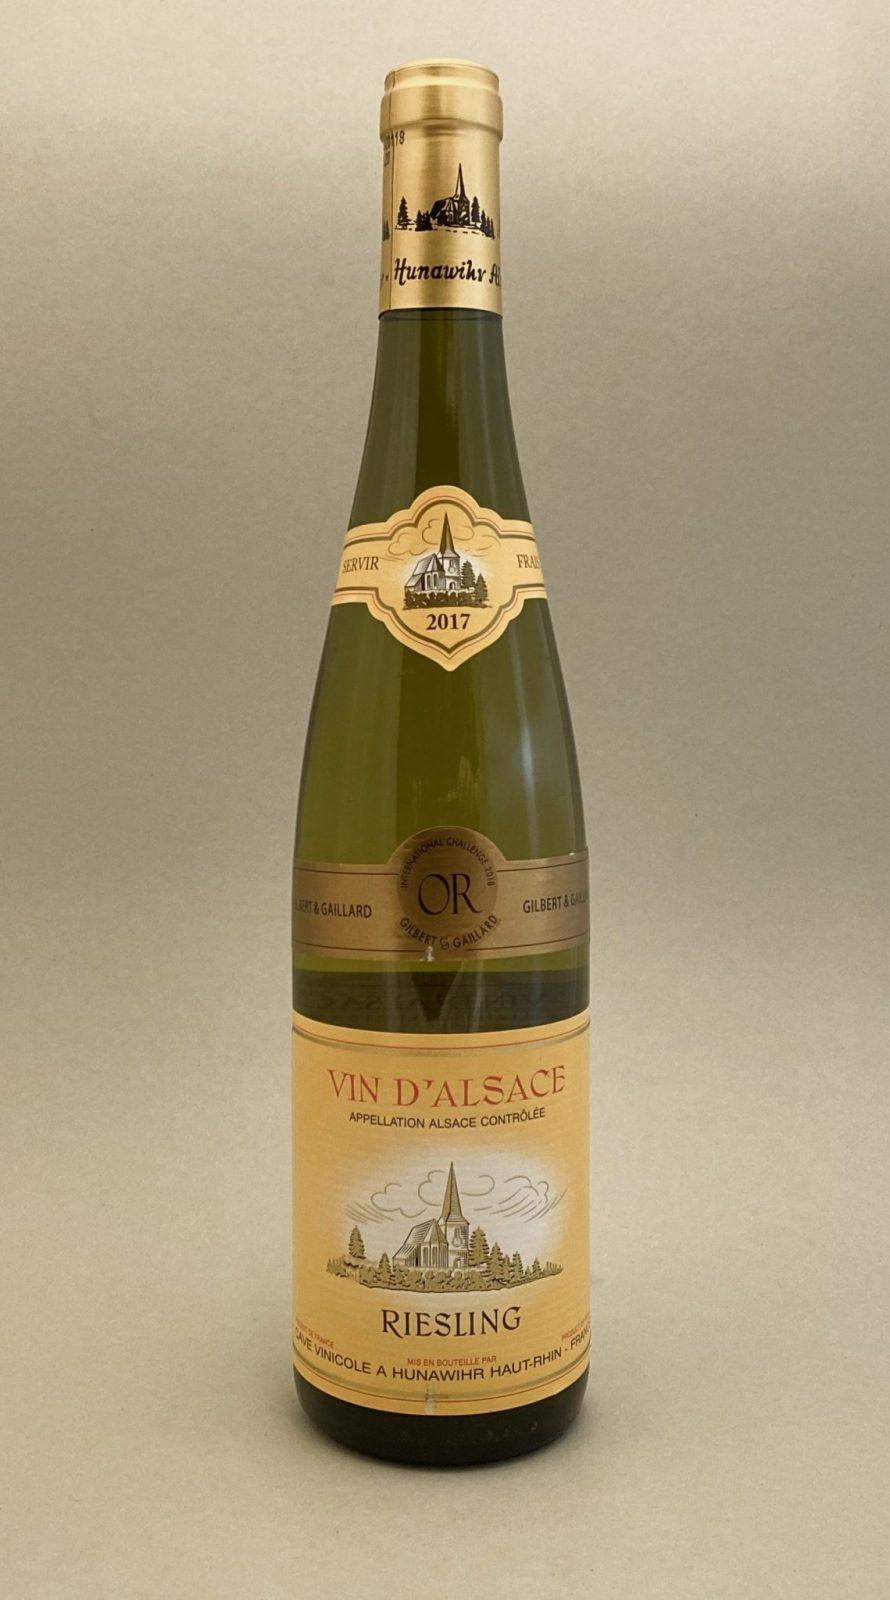 HUNAWIHR Vin D'Alsace Riesling 2017, vinoteka Bratislava slnecnice mesto, petrzalka, vino biele z Francúzska